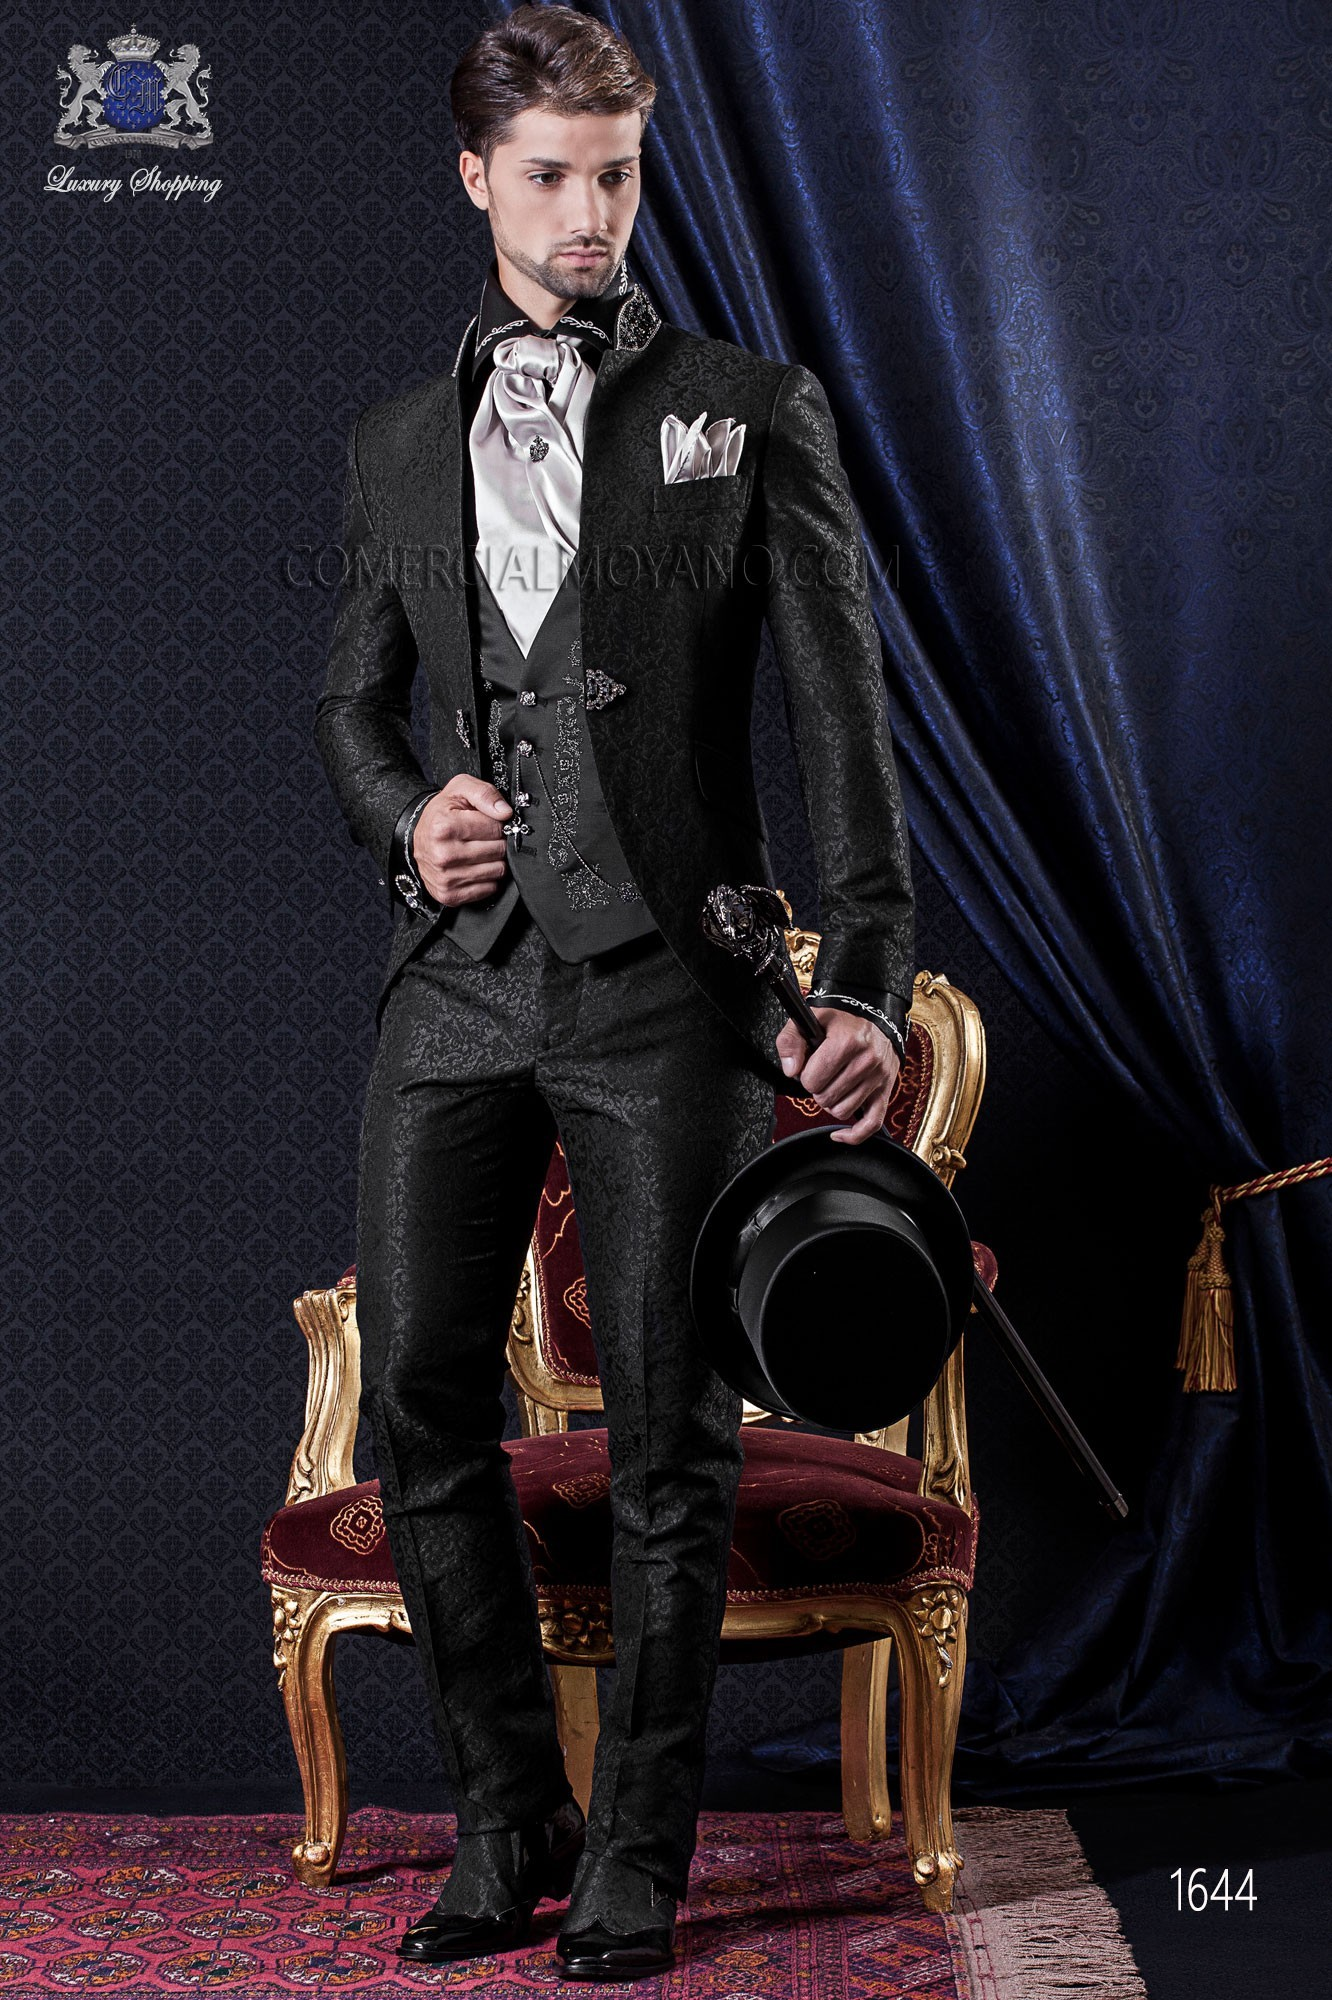 Anzug Barock. Klassiker Anzug Mantel schwarze Jacquard Stoff mit Stehkragen.